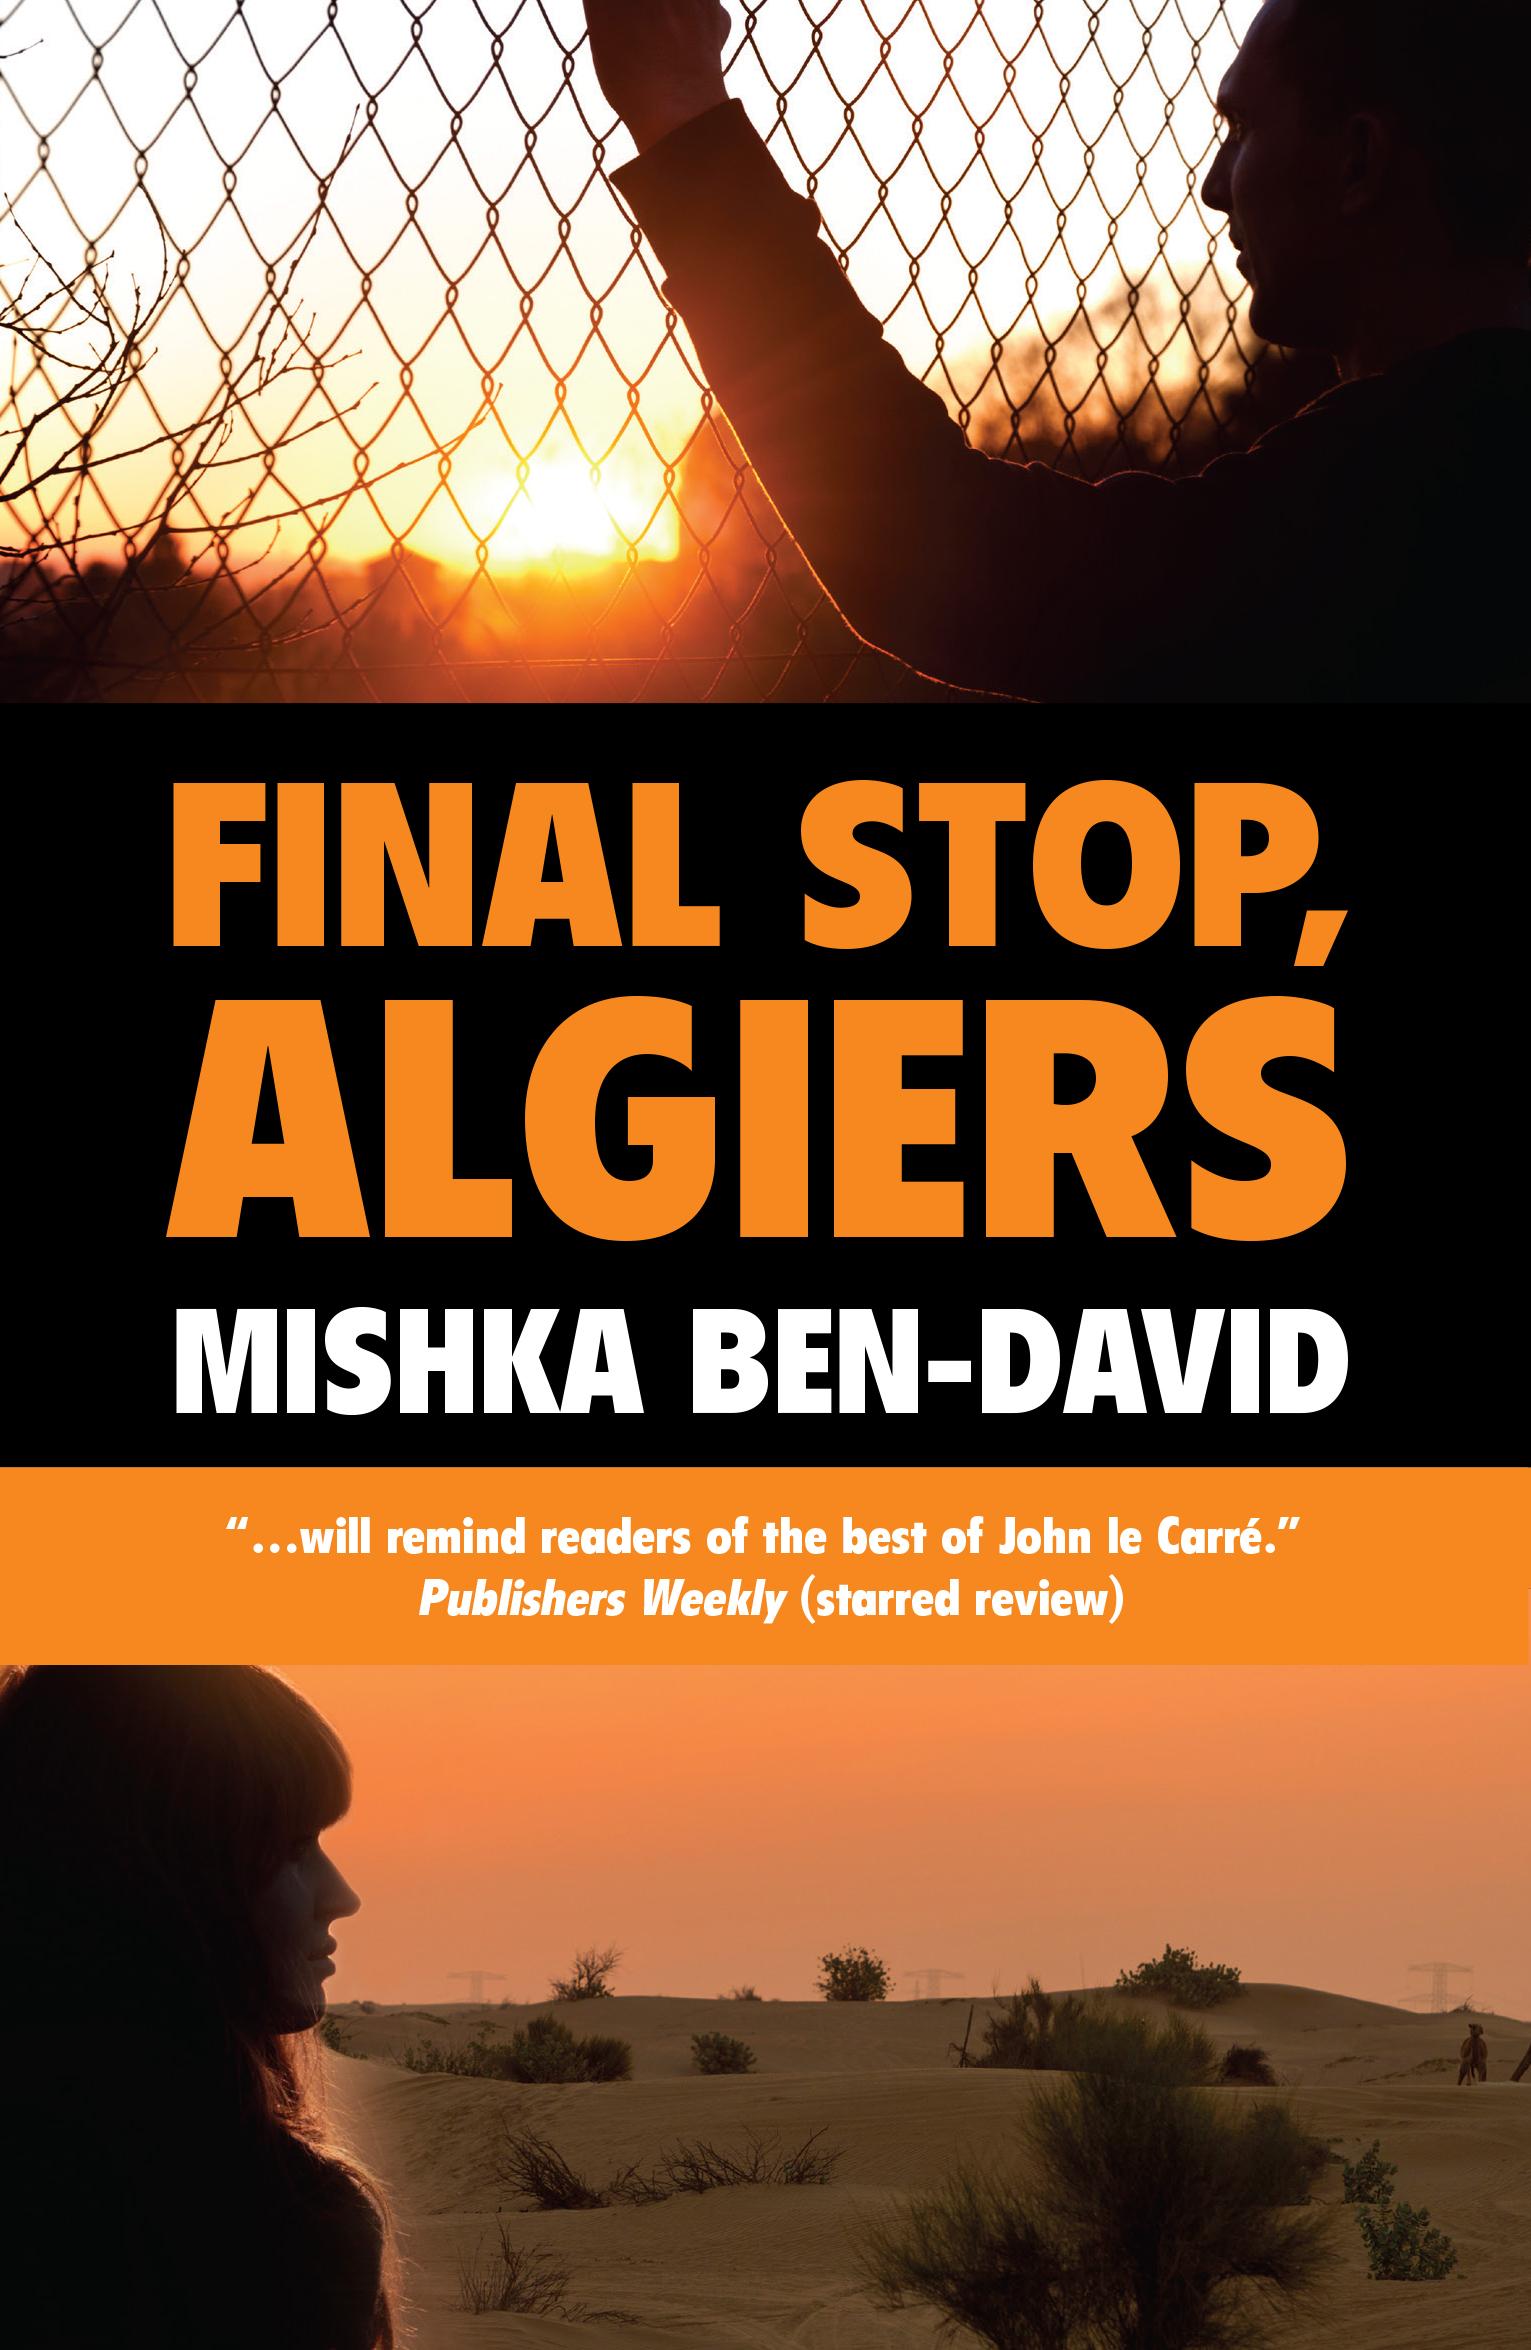 final-stop-algiers.jpg